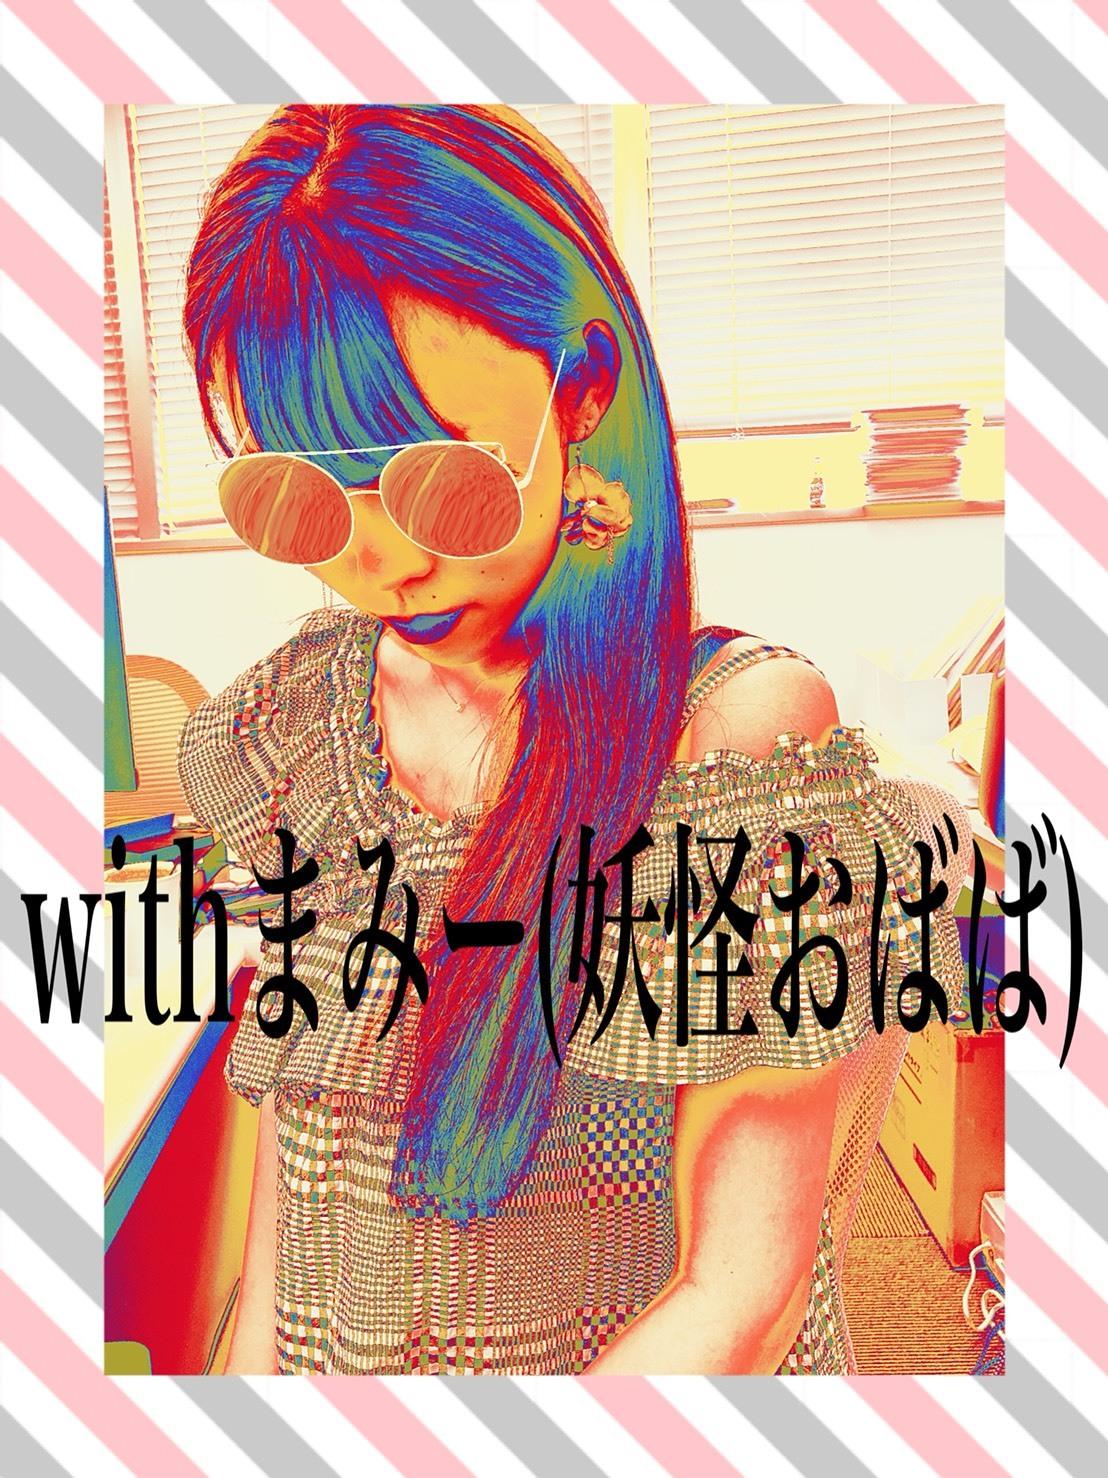 S__34471954.jpg